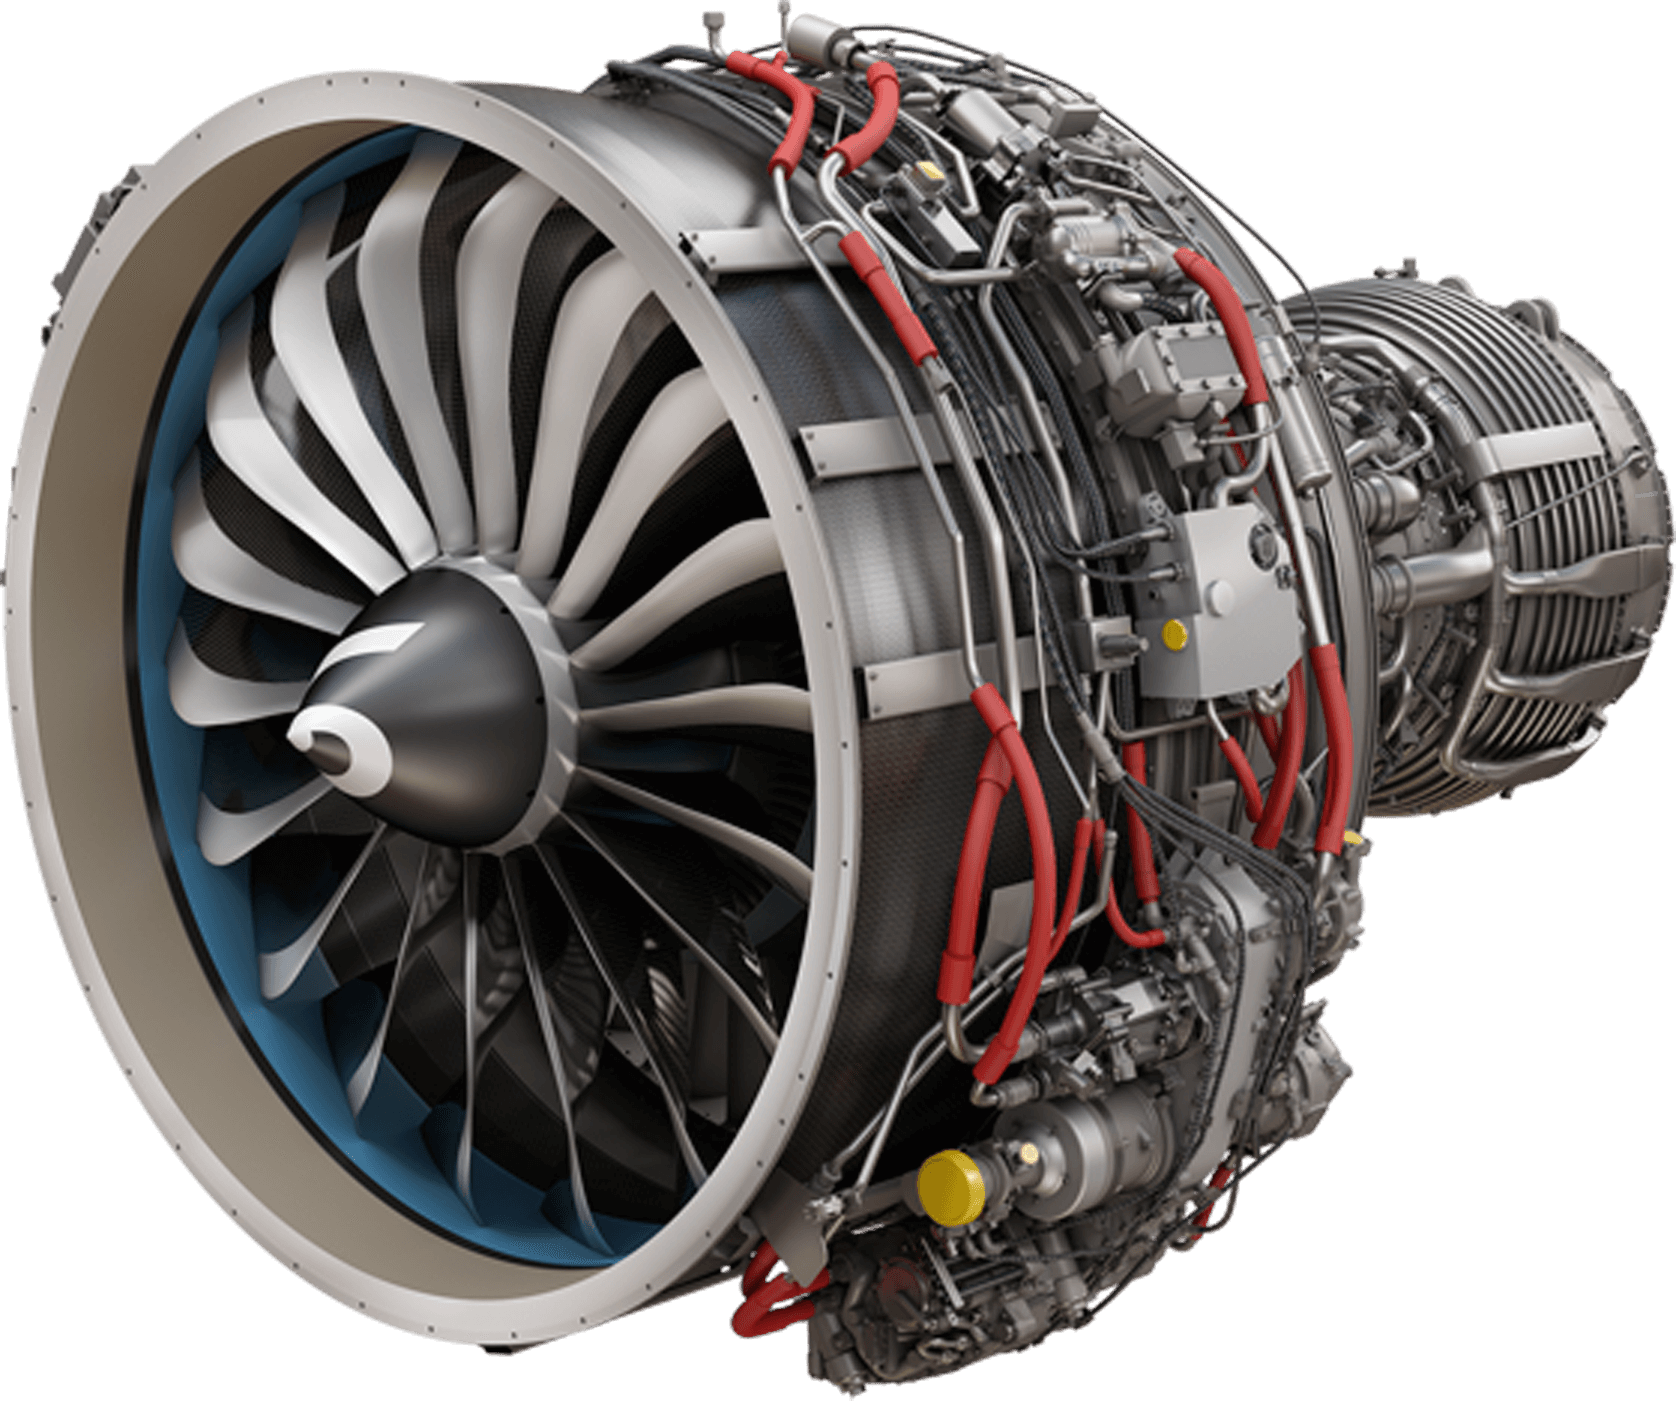 Engine clipart aircraft engine. Cfm timeline